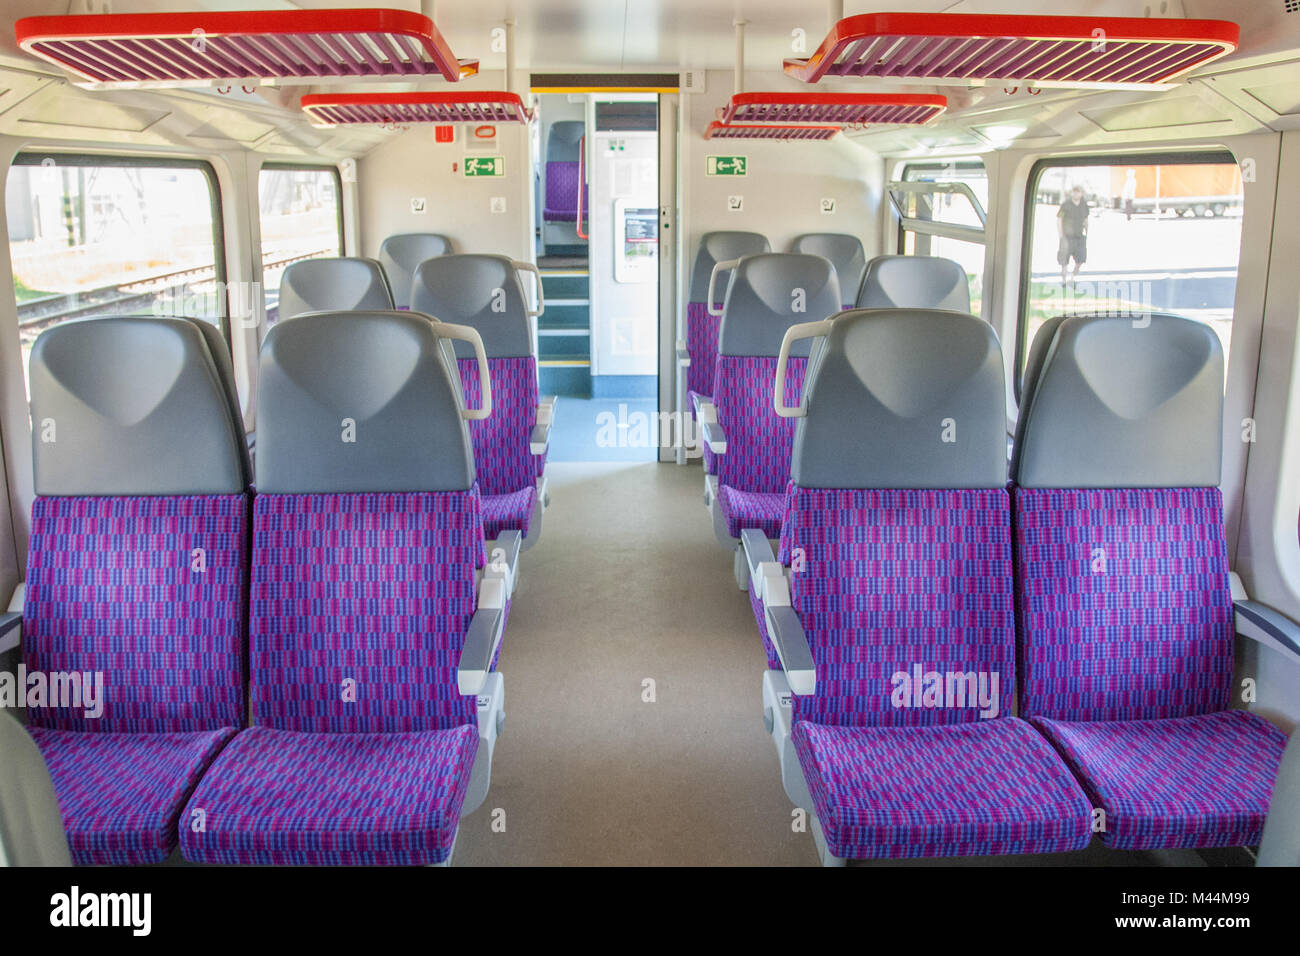 Tschechische Regional-Train am Skoda-Plant in Pilsen Stockbild